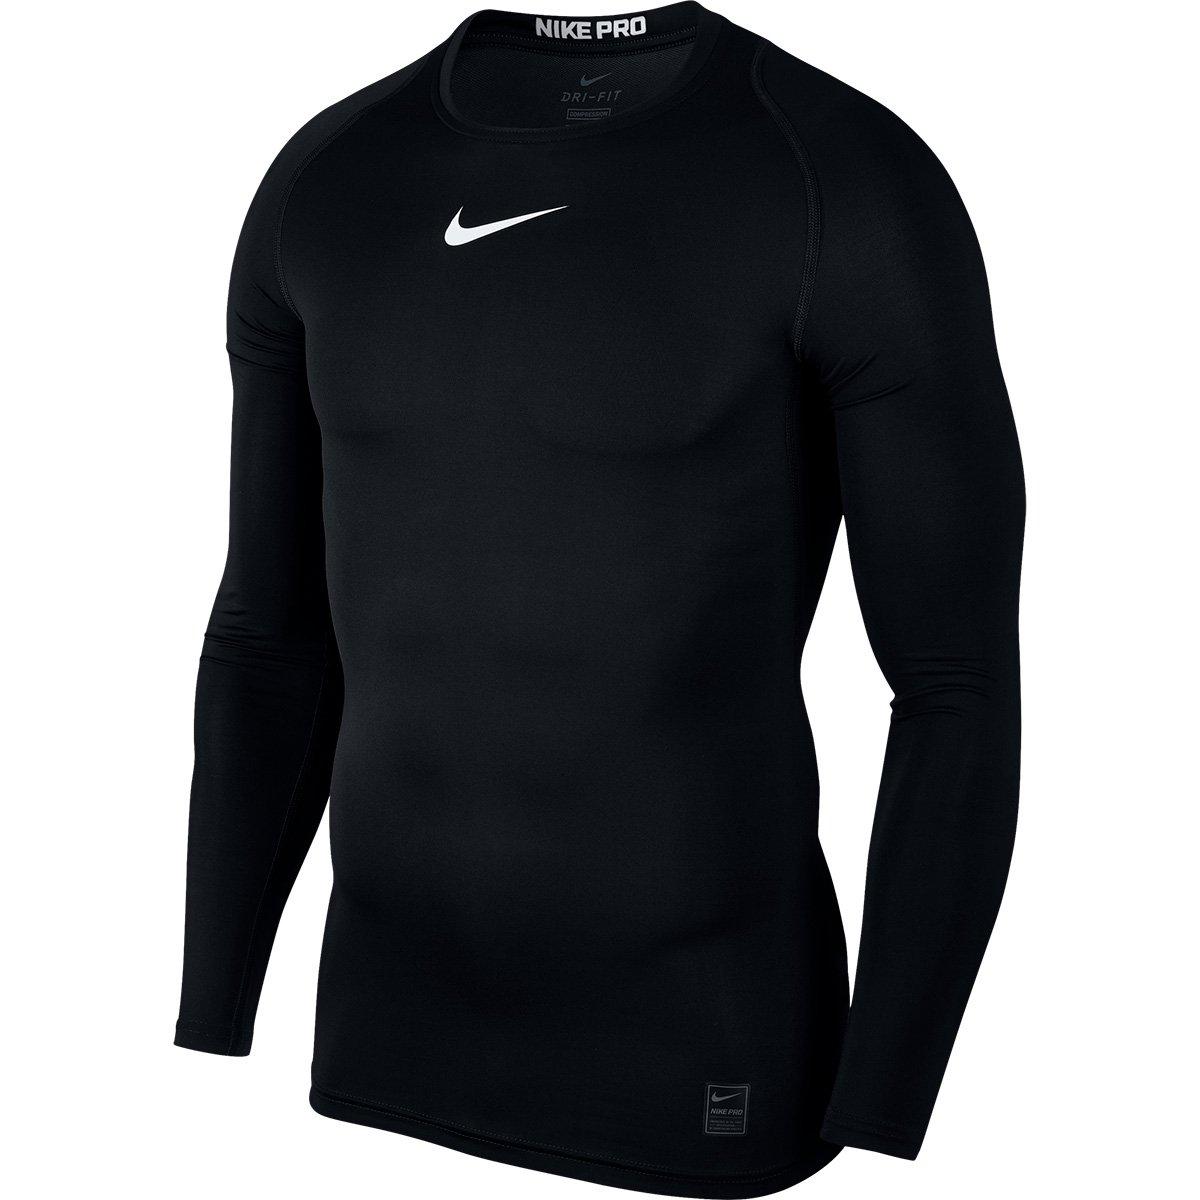 e633e1065542 Camiseta Compressão Nike Pro Manga Longa Masculina | Livelo -Sua ...